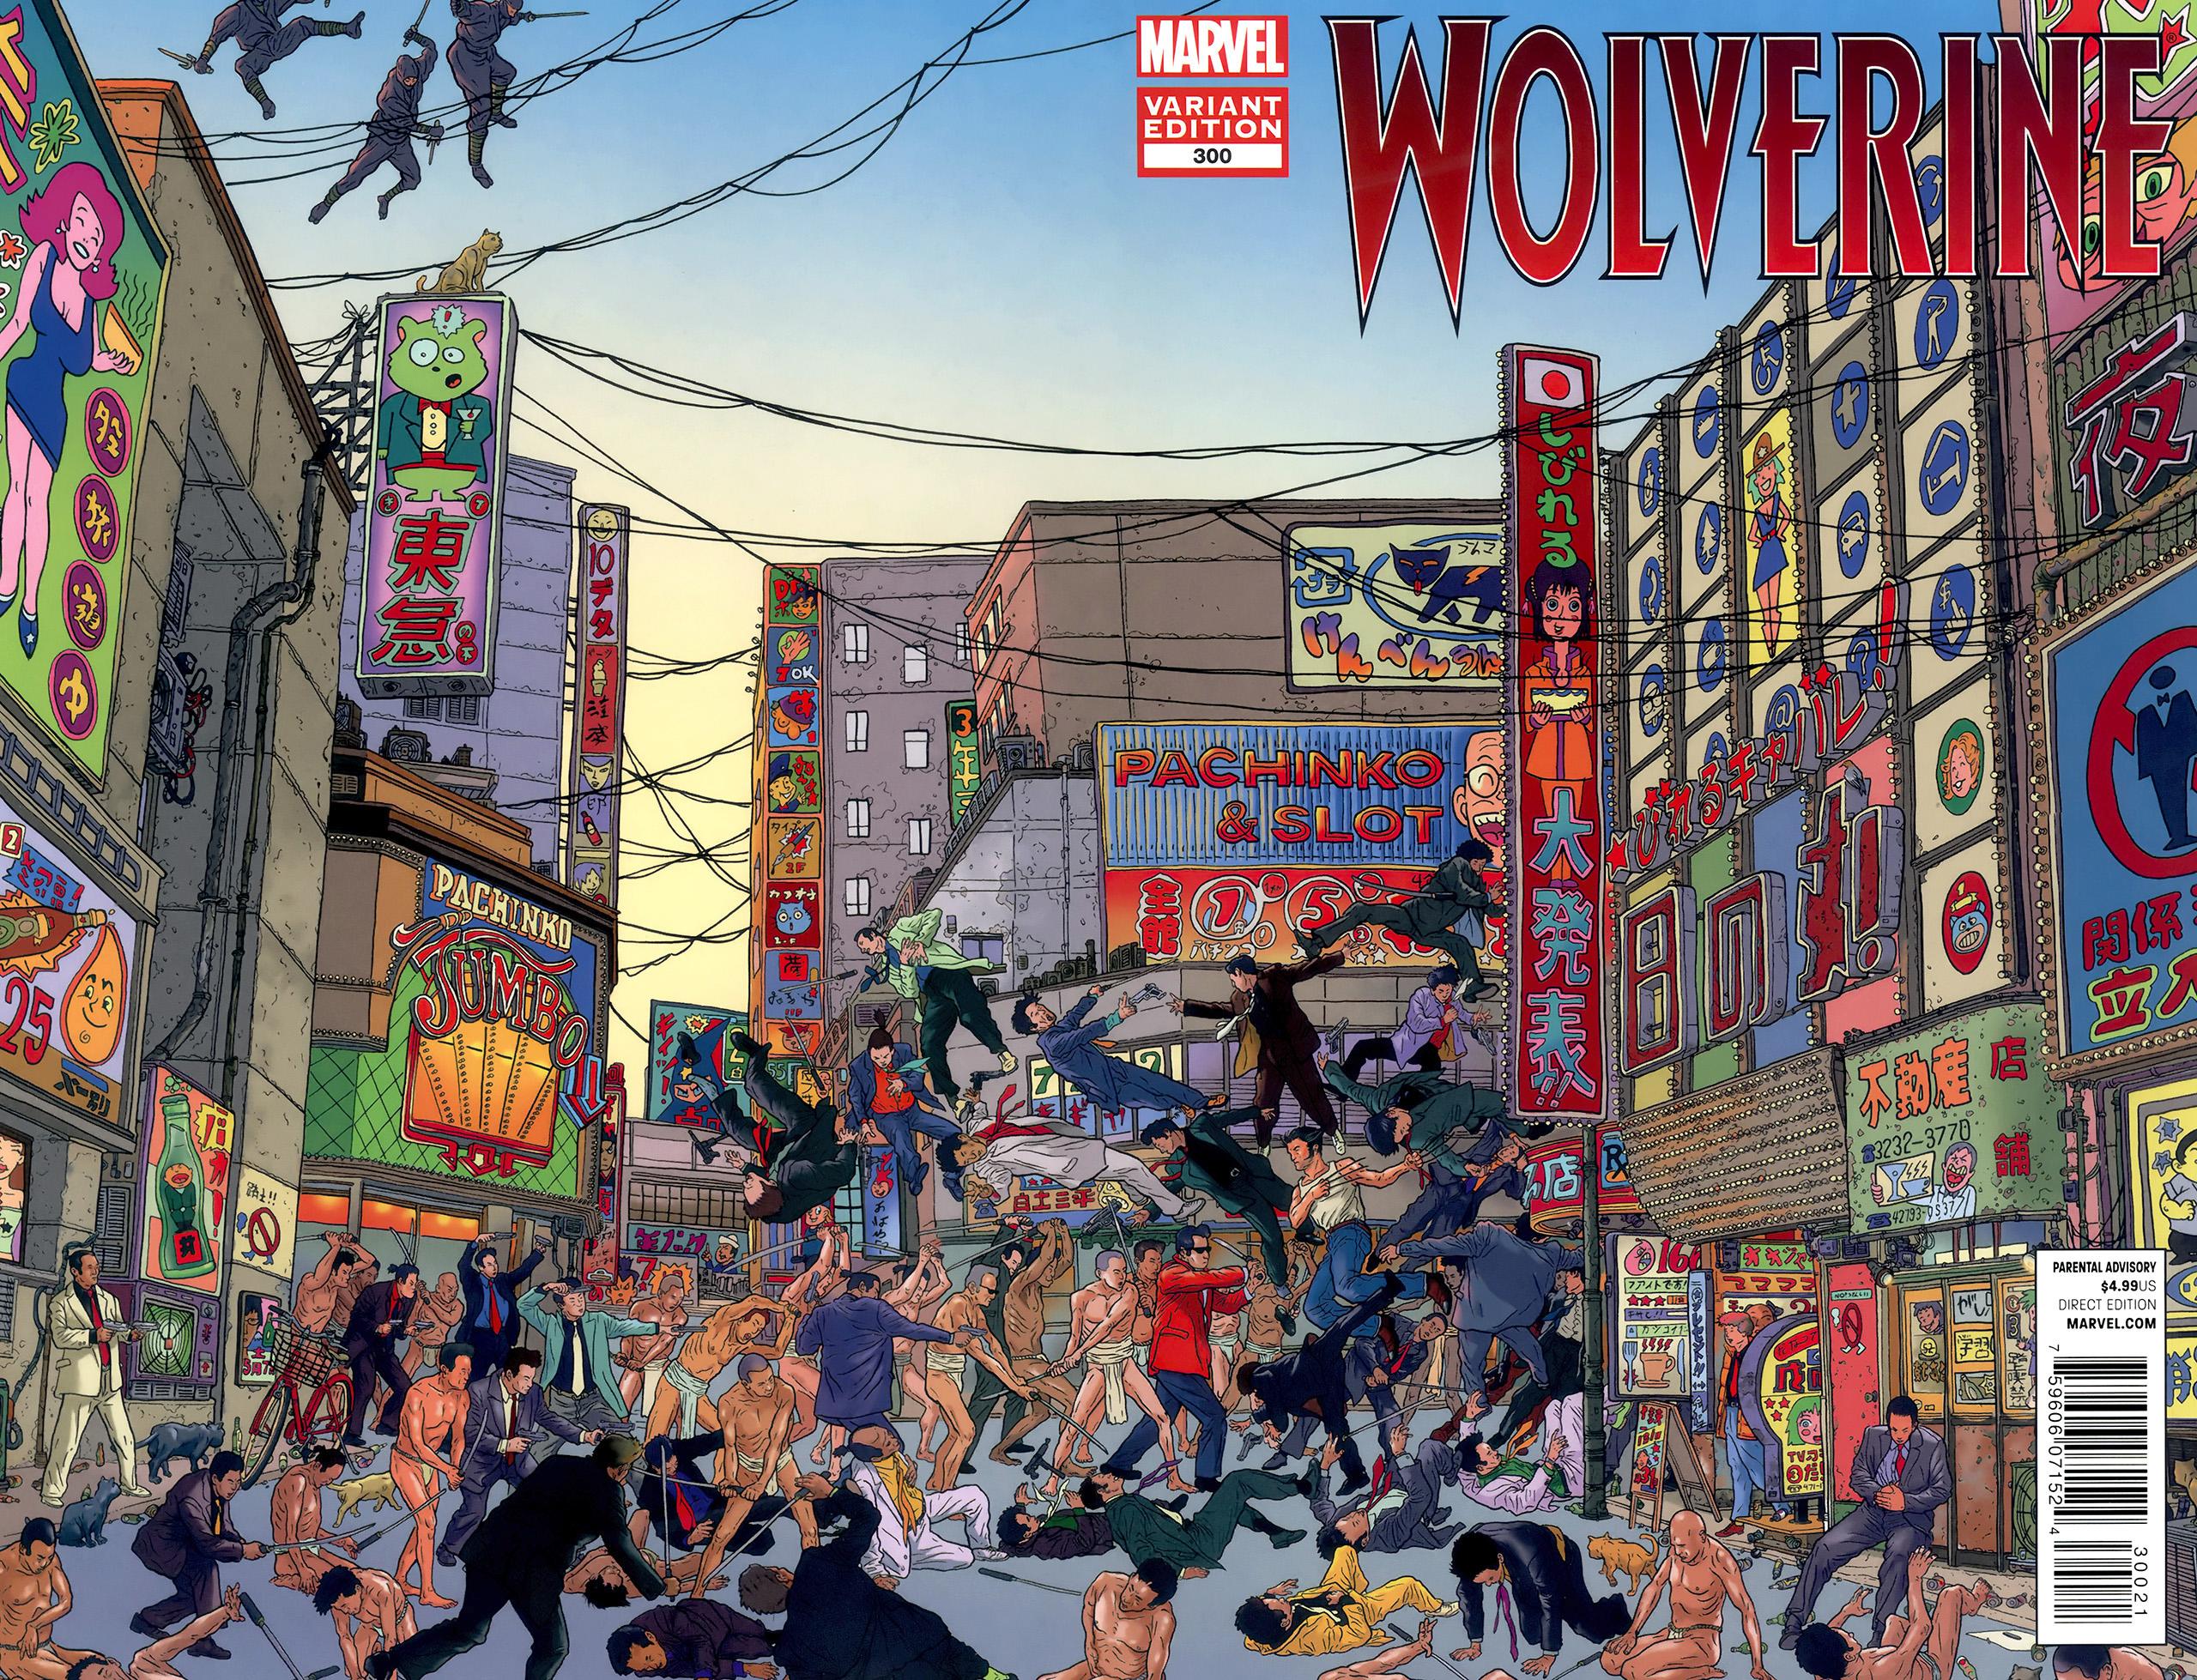 Wolverine Vol 2 300 Geof Darrow Wraparound Variant.jpg